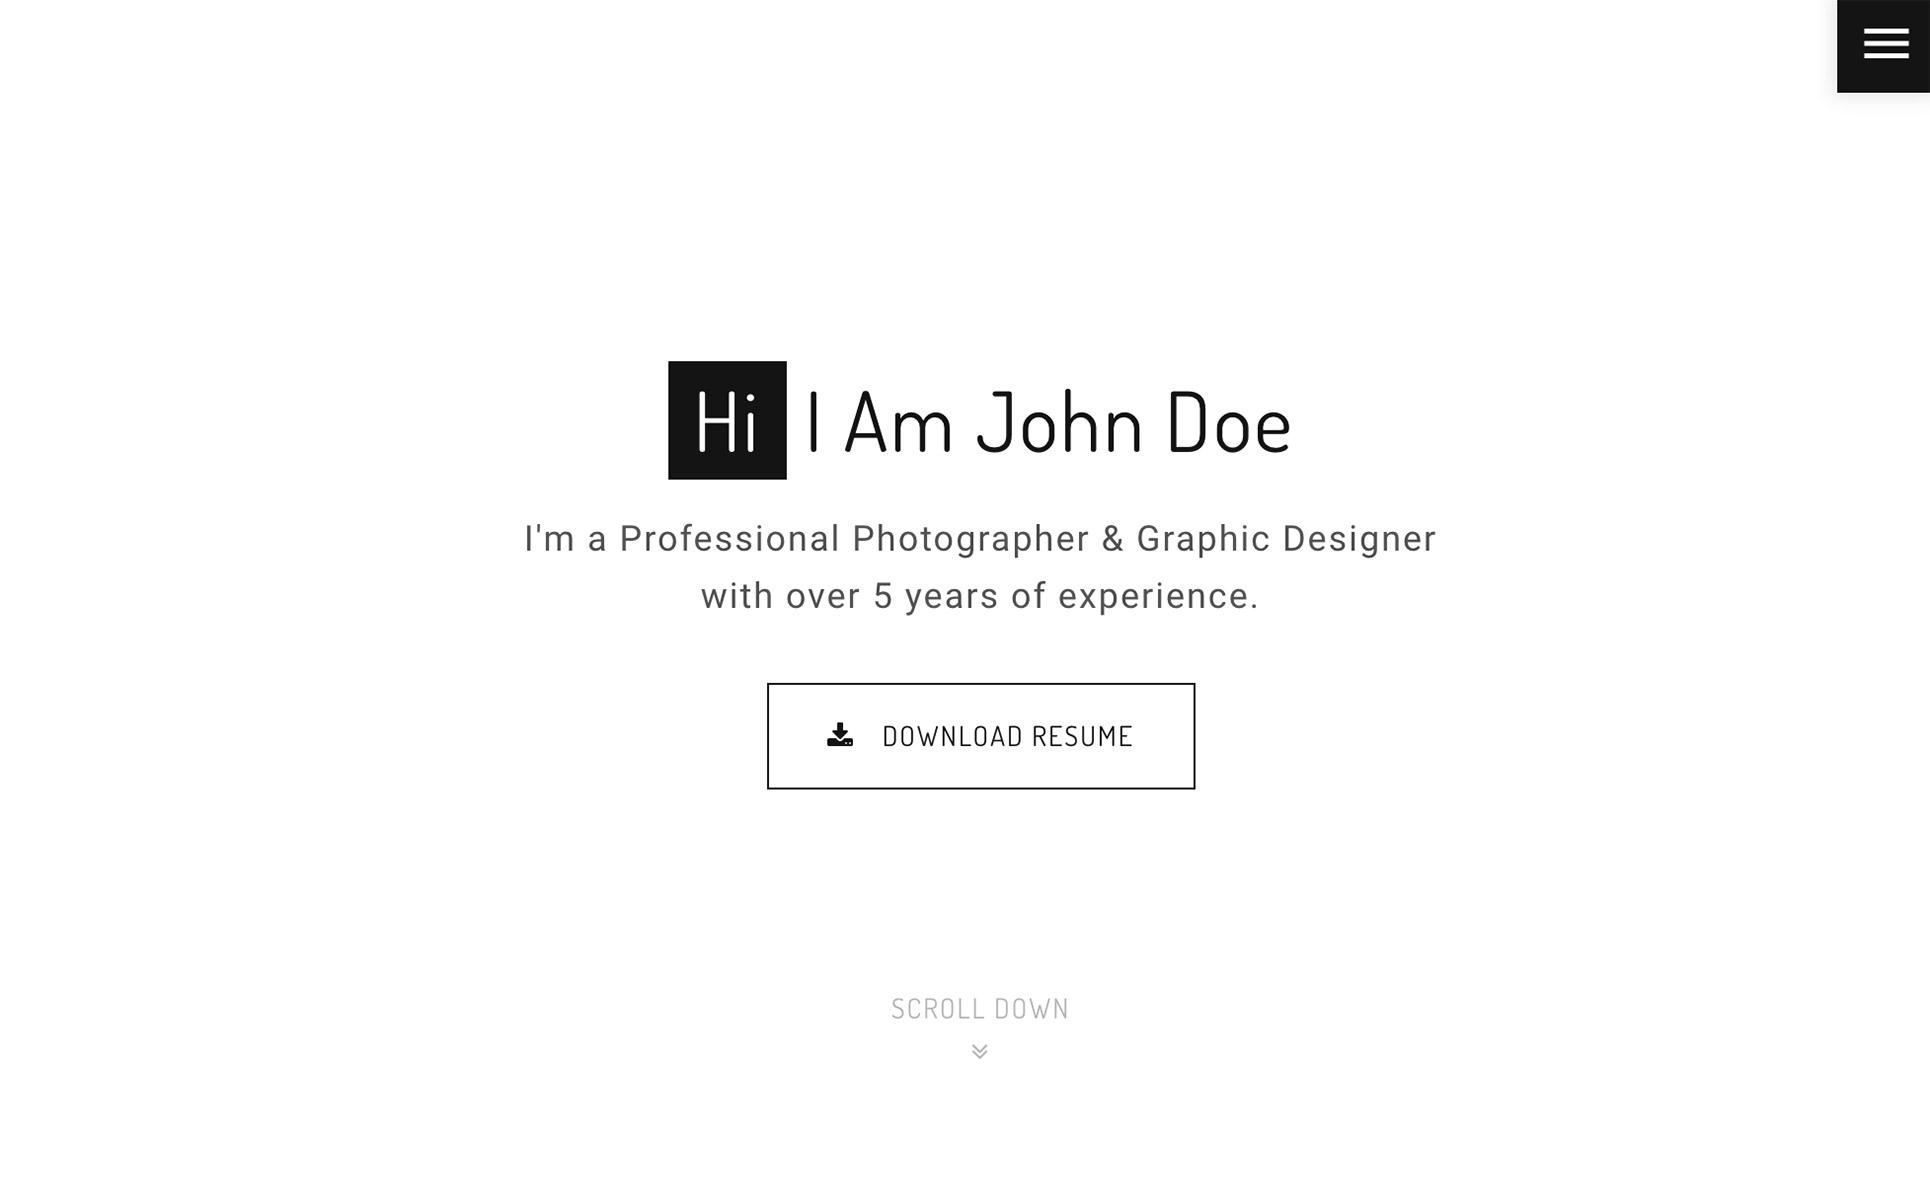 John Doe - Photography HTML Website Template #64749